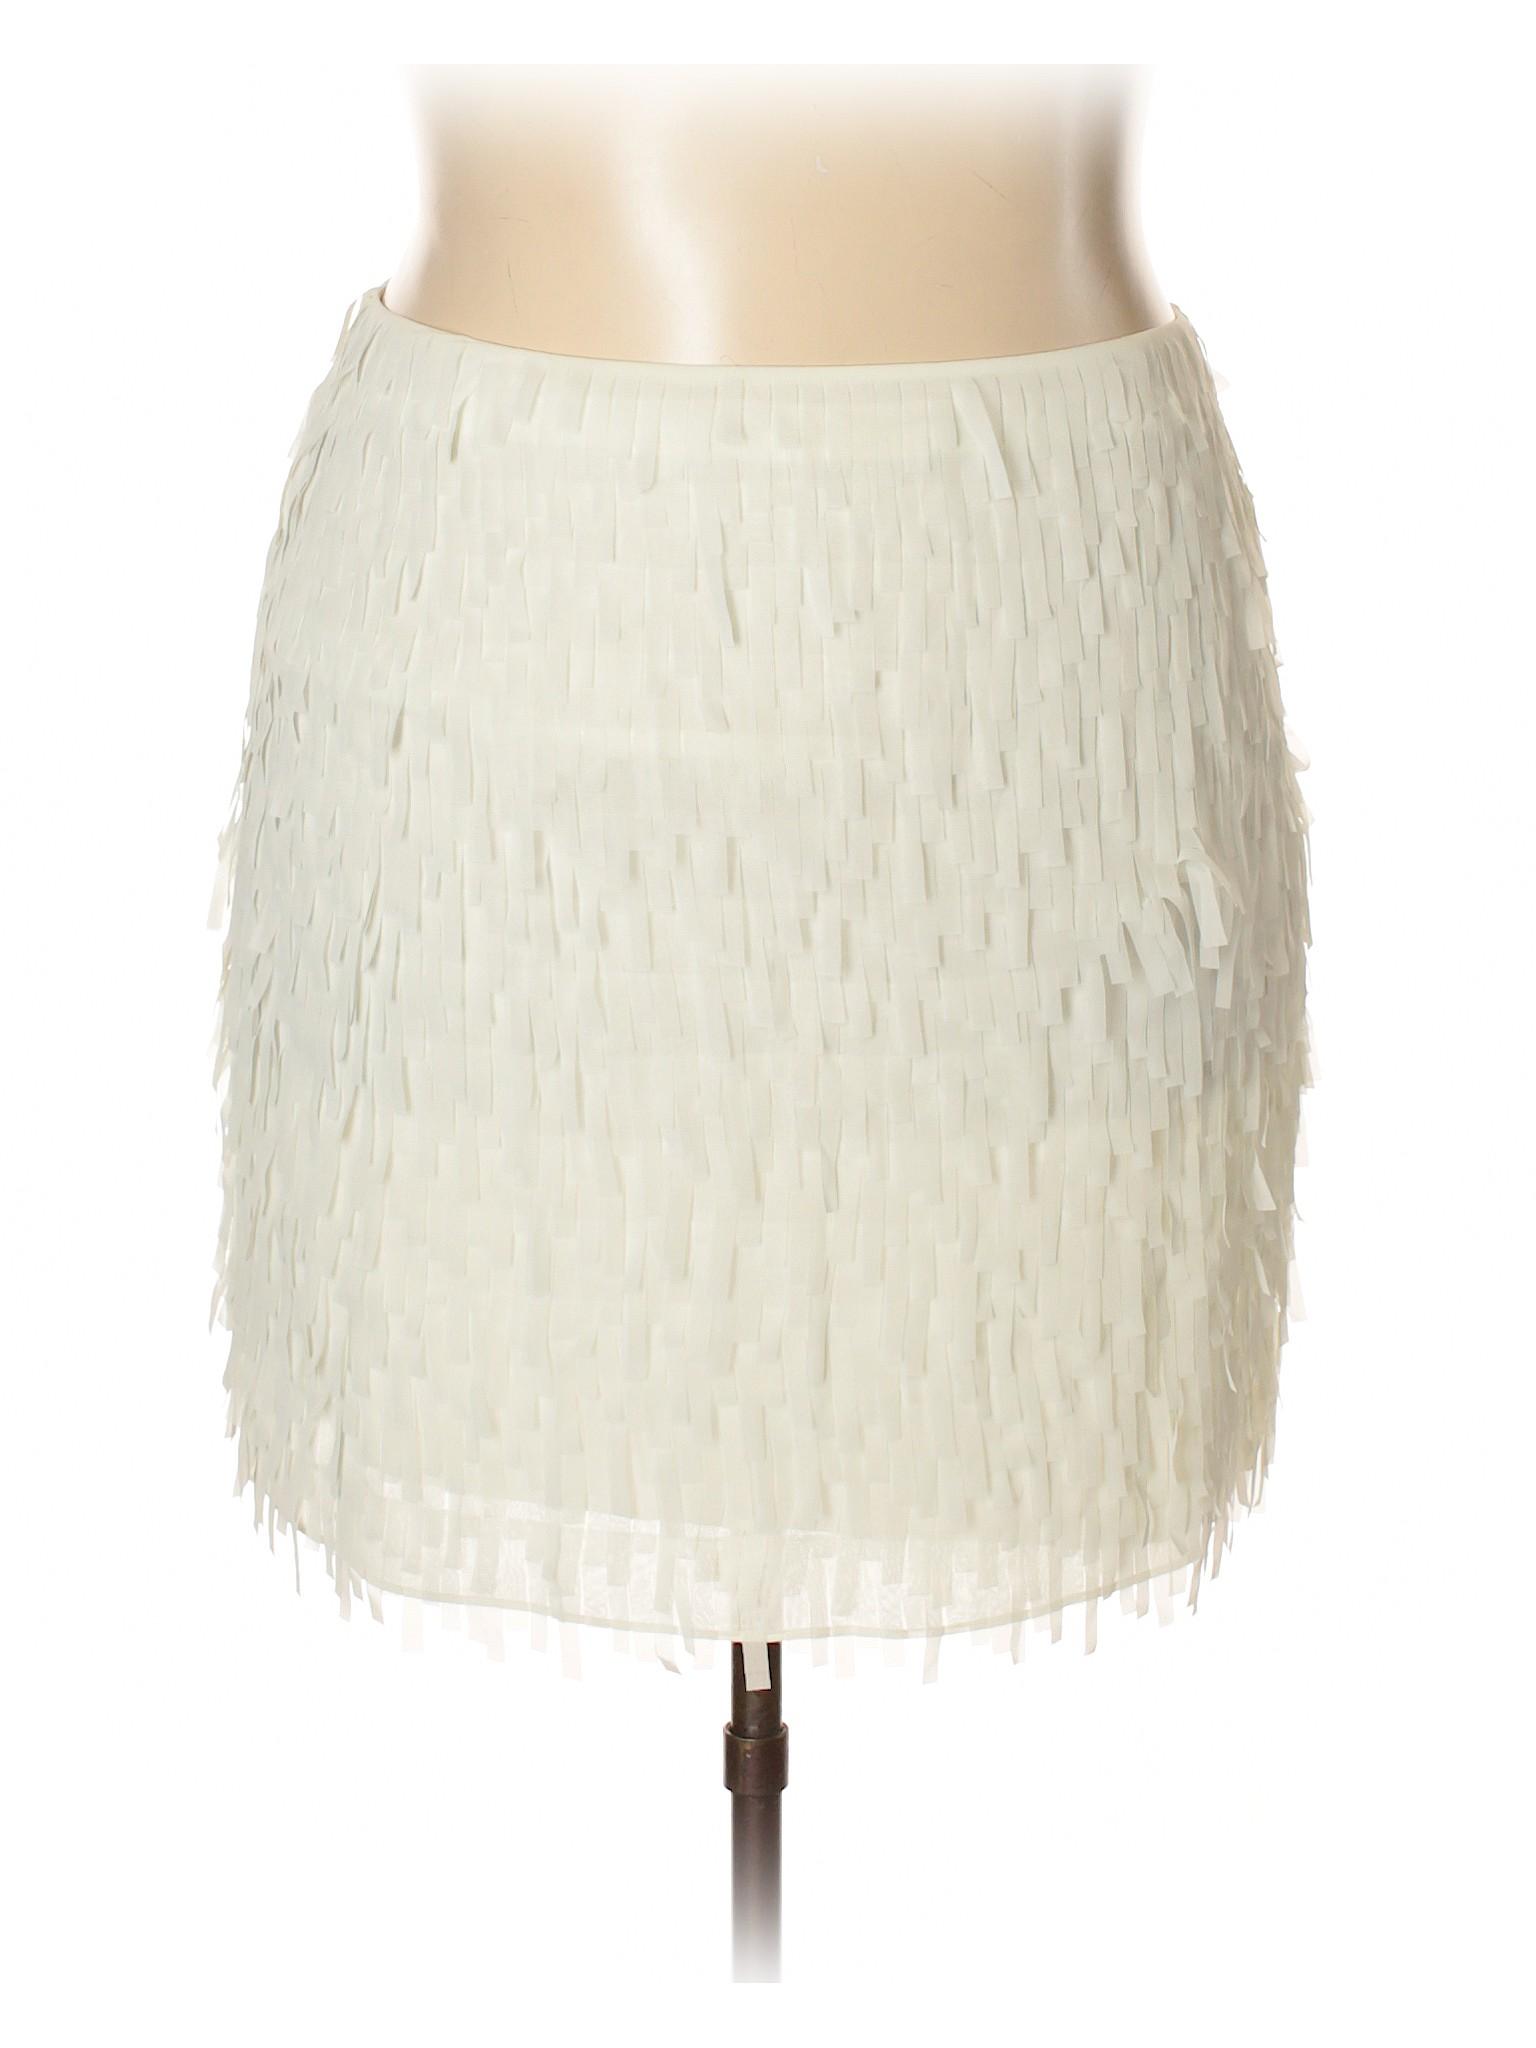 Casual Casual Boutique Taylor Skirt Taylor Boutique Ann Ann g6qYzvgw